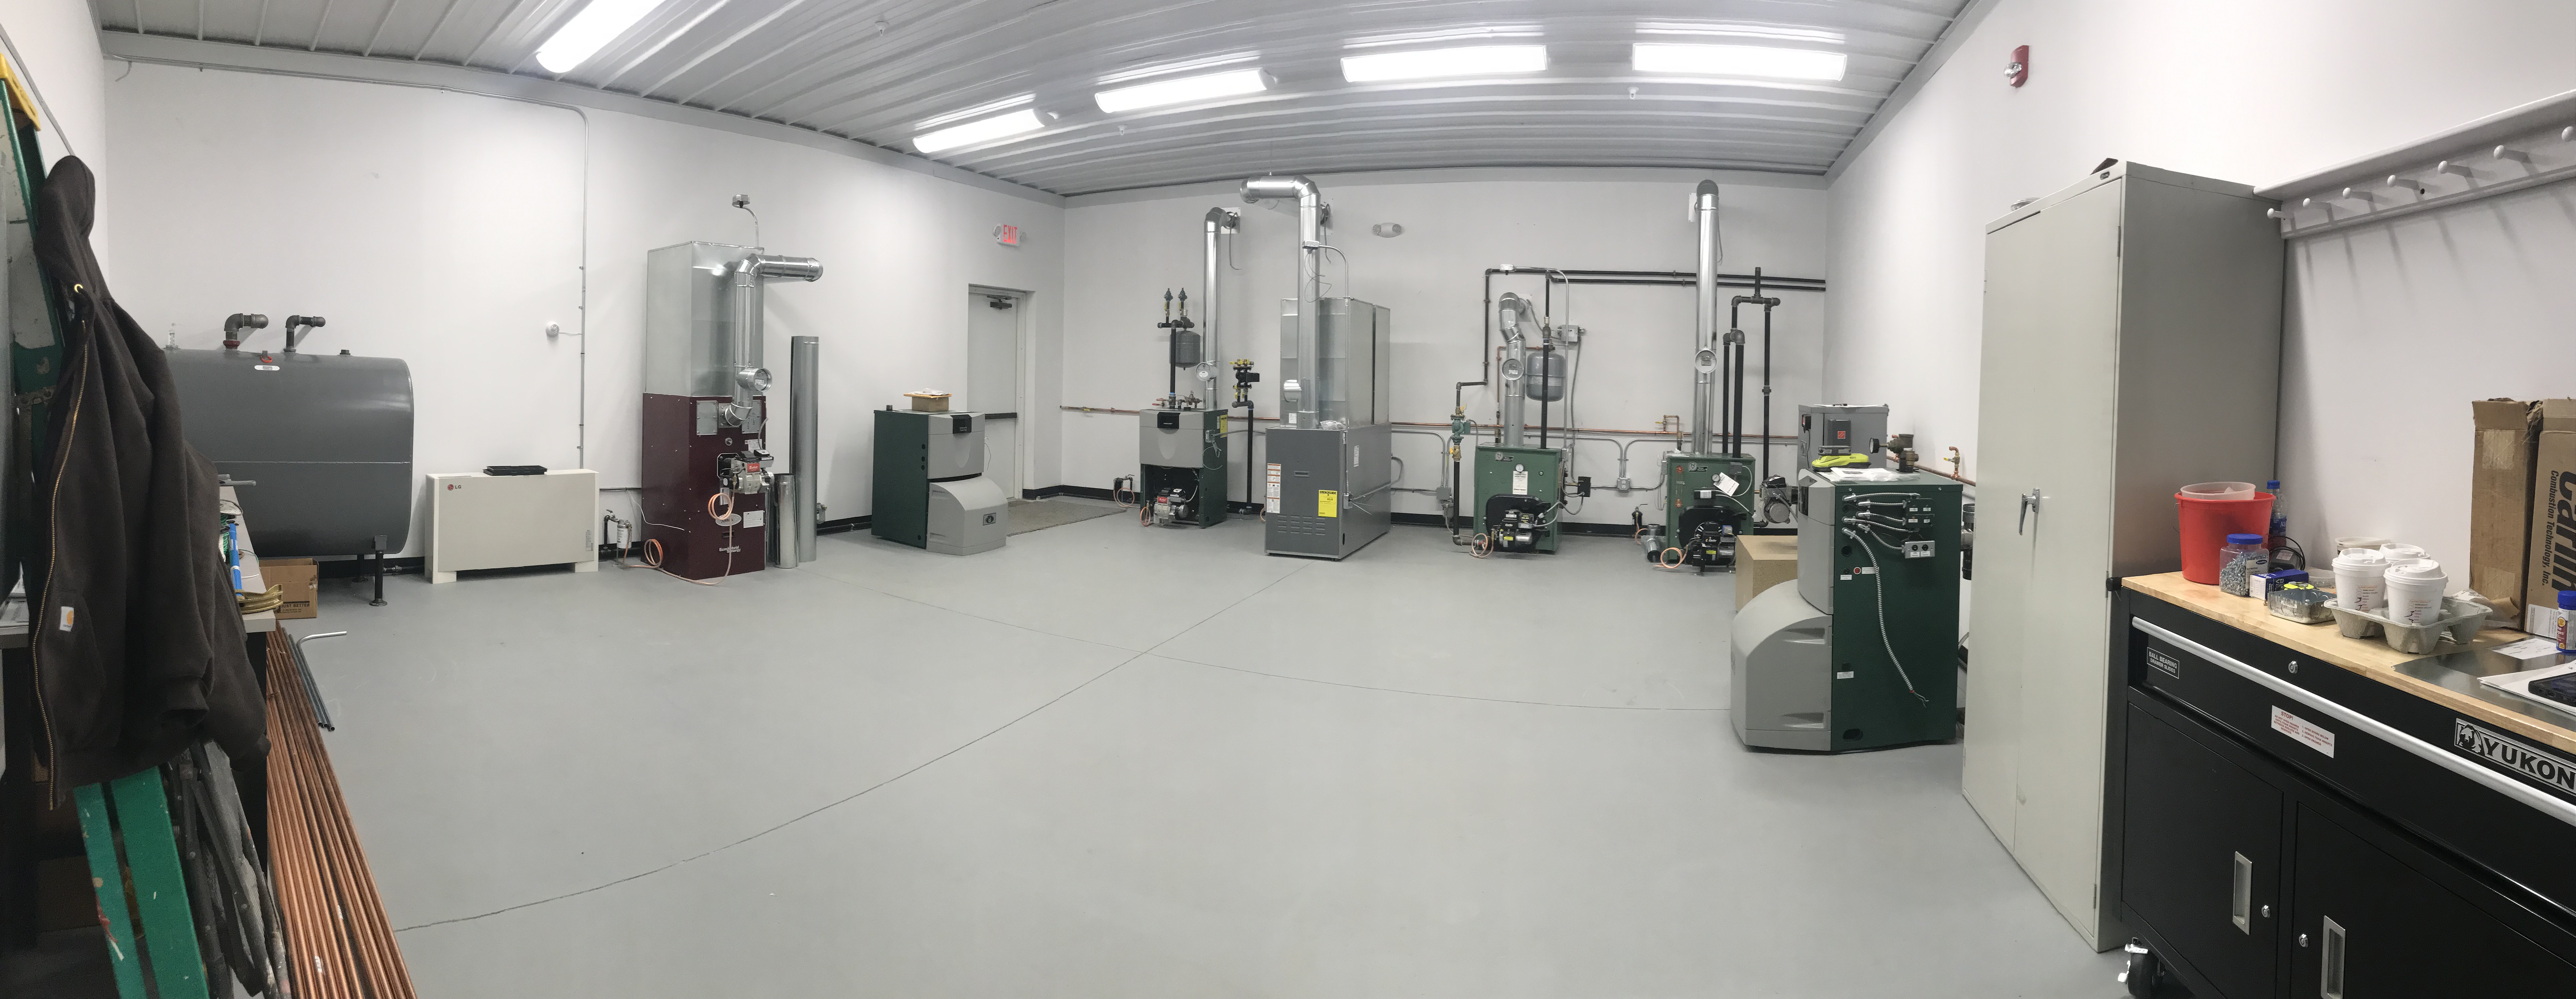 Oil Lab - Hampton